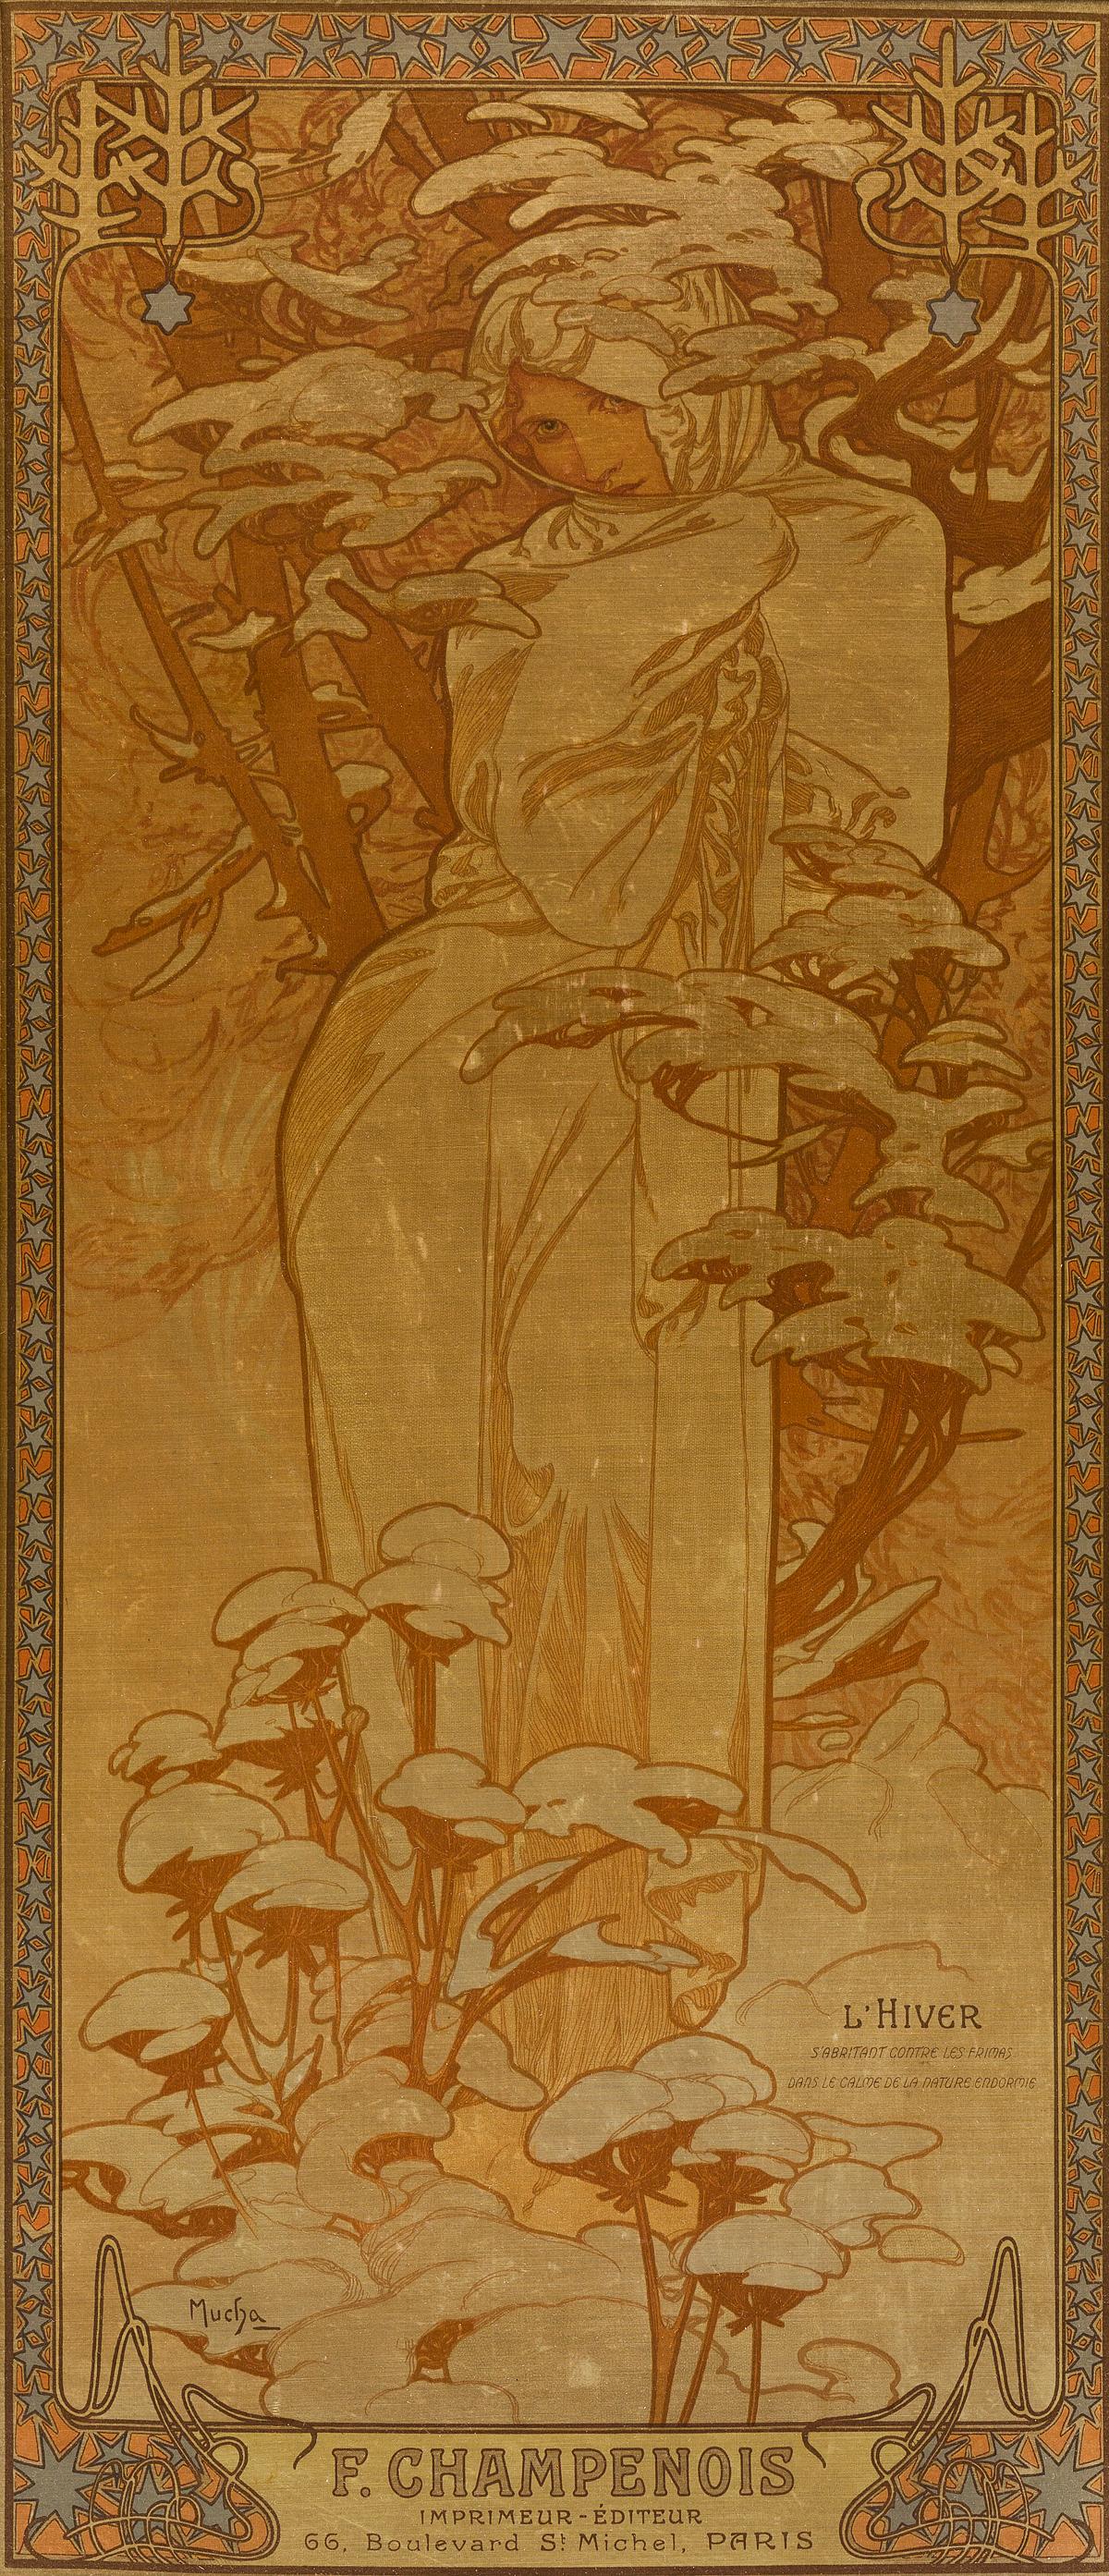 ALPHONSE MUCHA (1860-1939). [THE SEASONS / LHIVER.] Decorative panel on silk. 1900. 27x12 inches, 70x30 cm. F. Champenois, Paris.